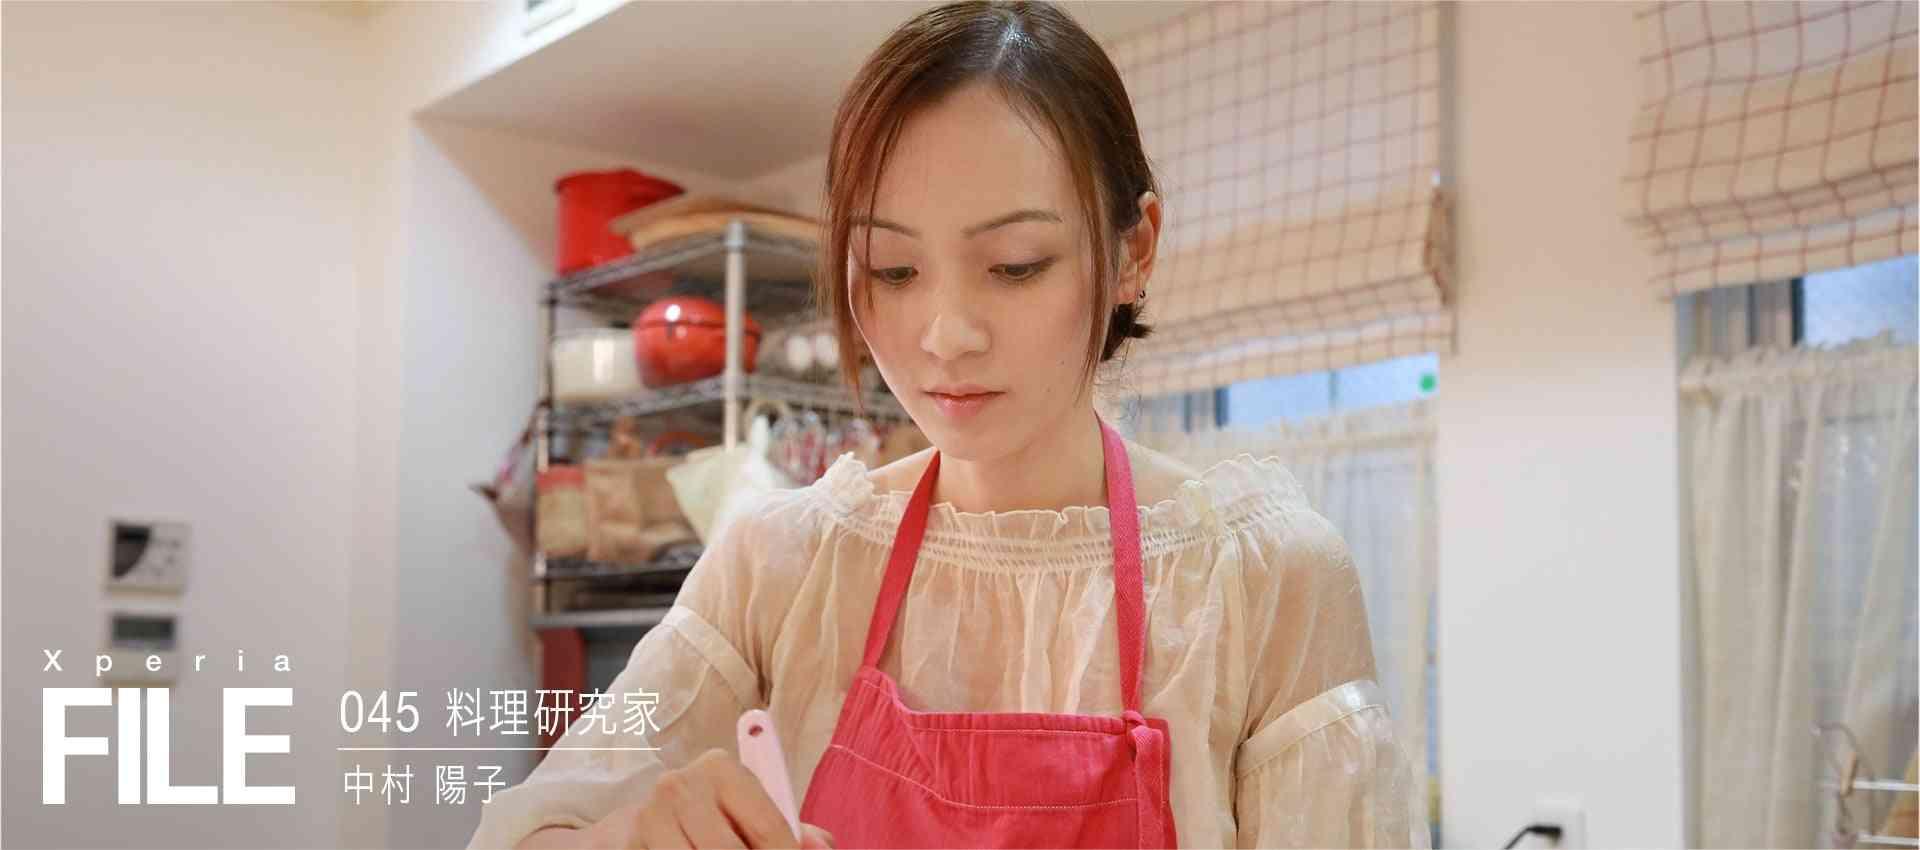 Xperia™ FILE 045:料理研究家 中村 陽子 | ソニーモバイルコミュニケーションズ